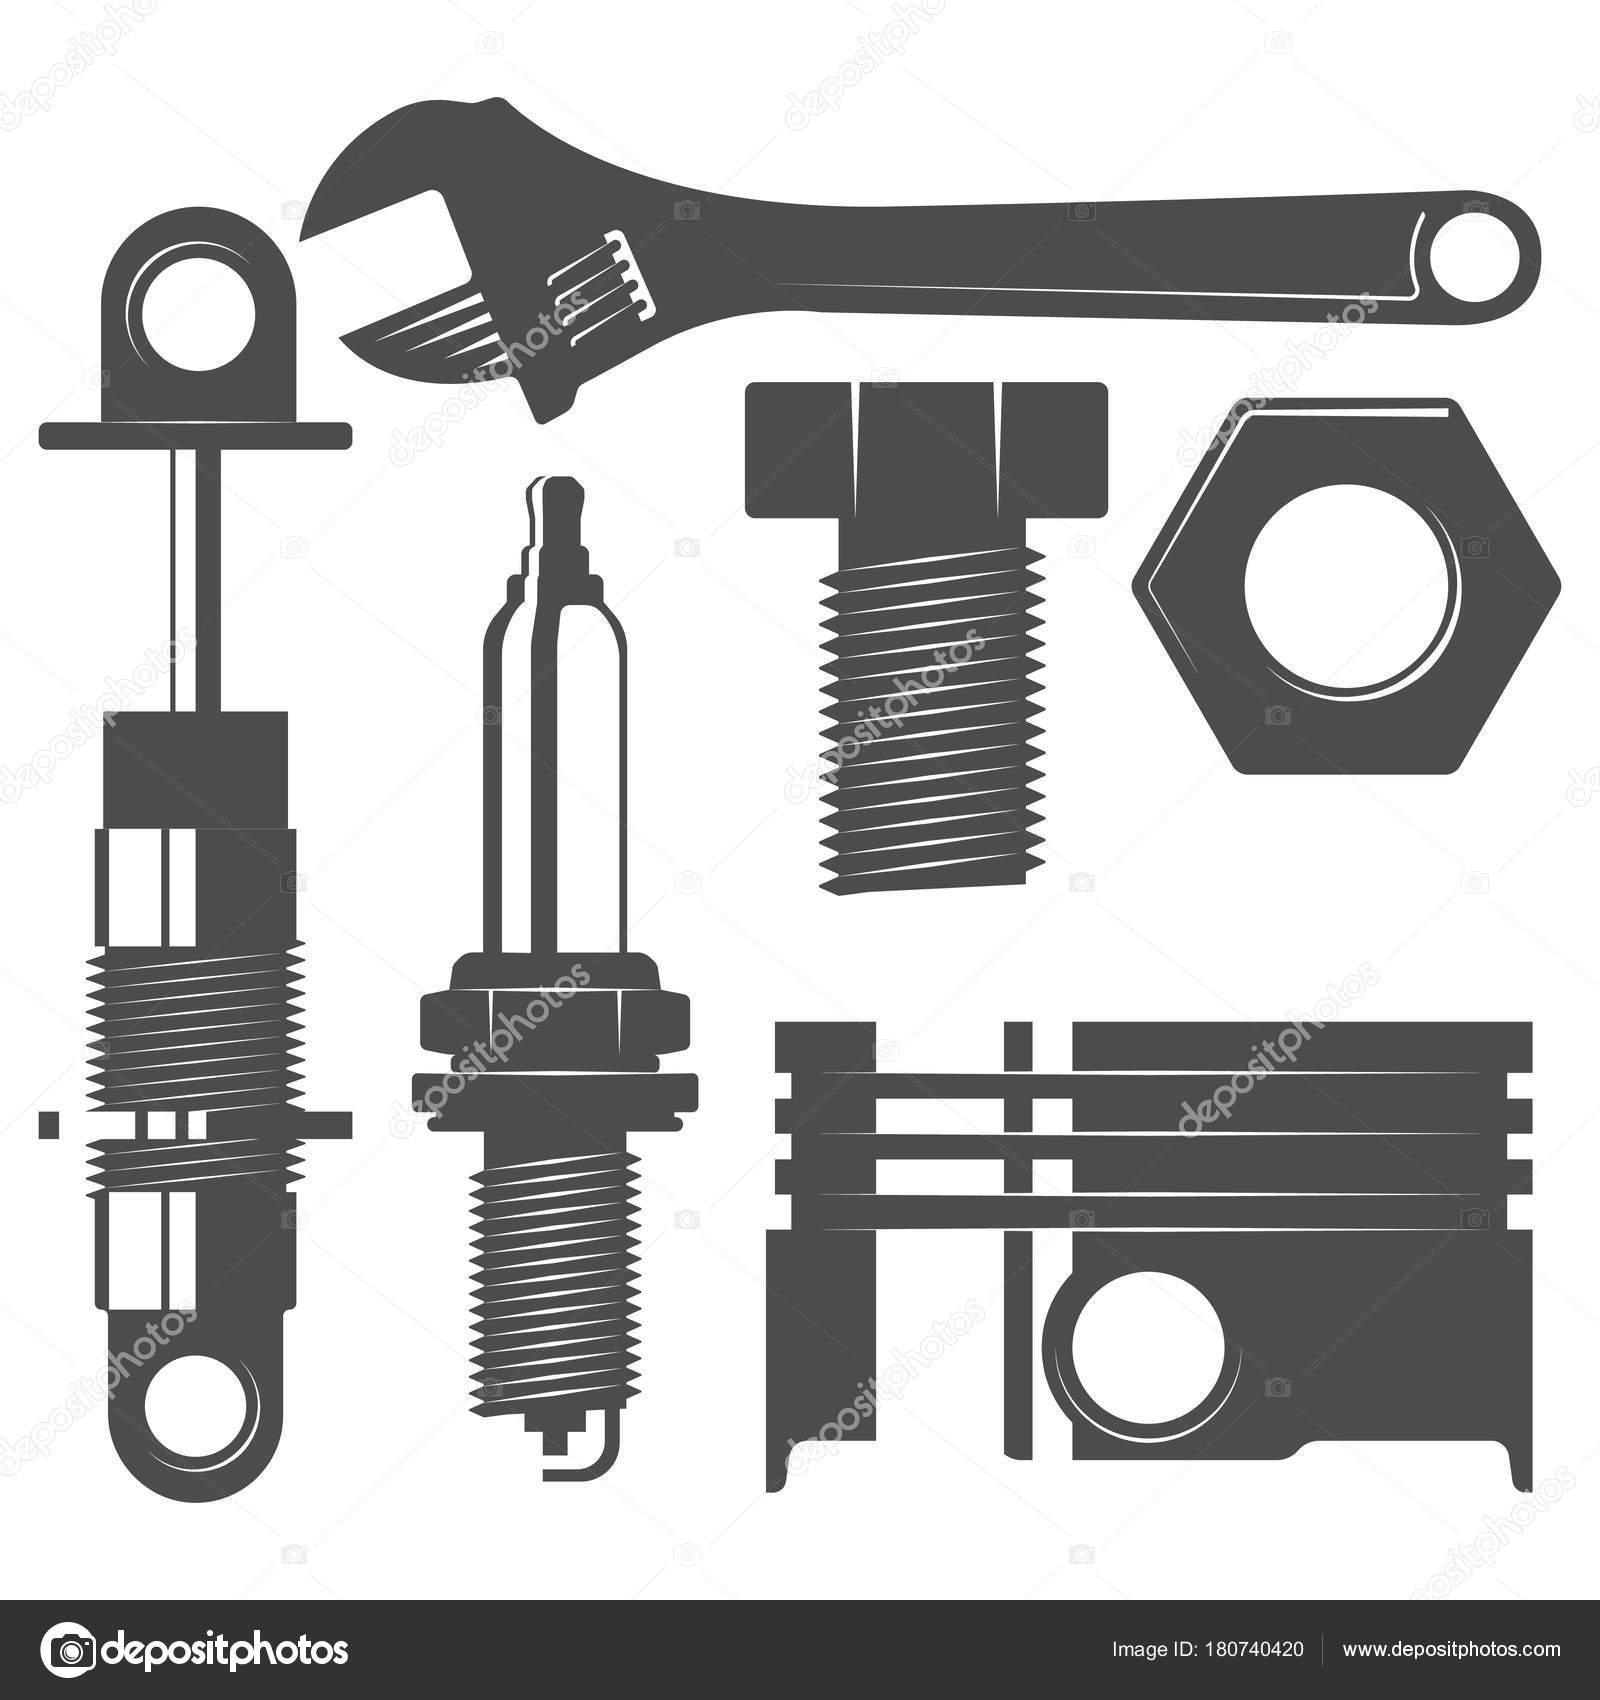 Monochrome Auto Parts Set Piston Wrench Shock Absorber Spark Plug ...